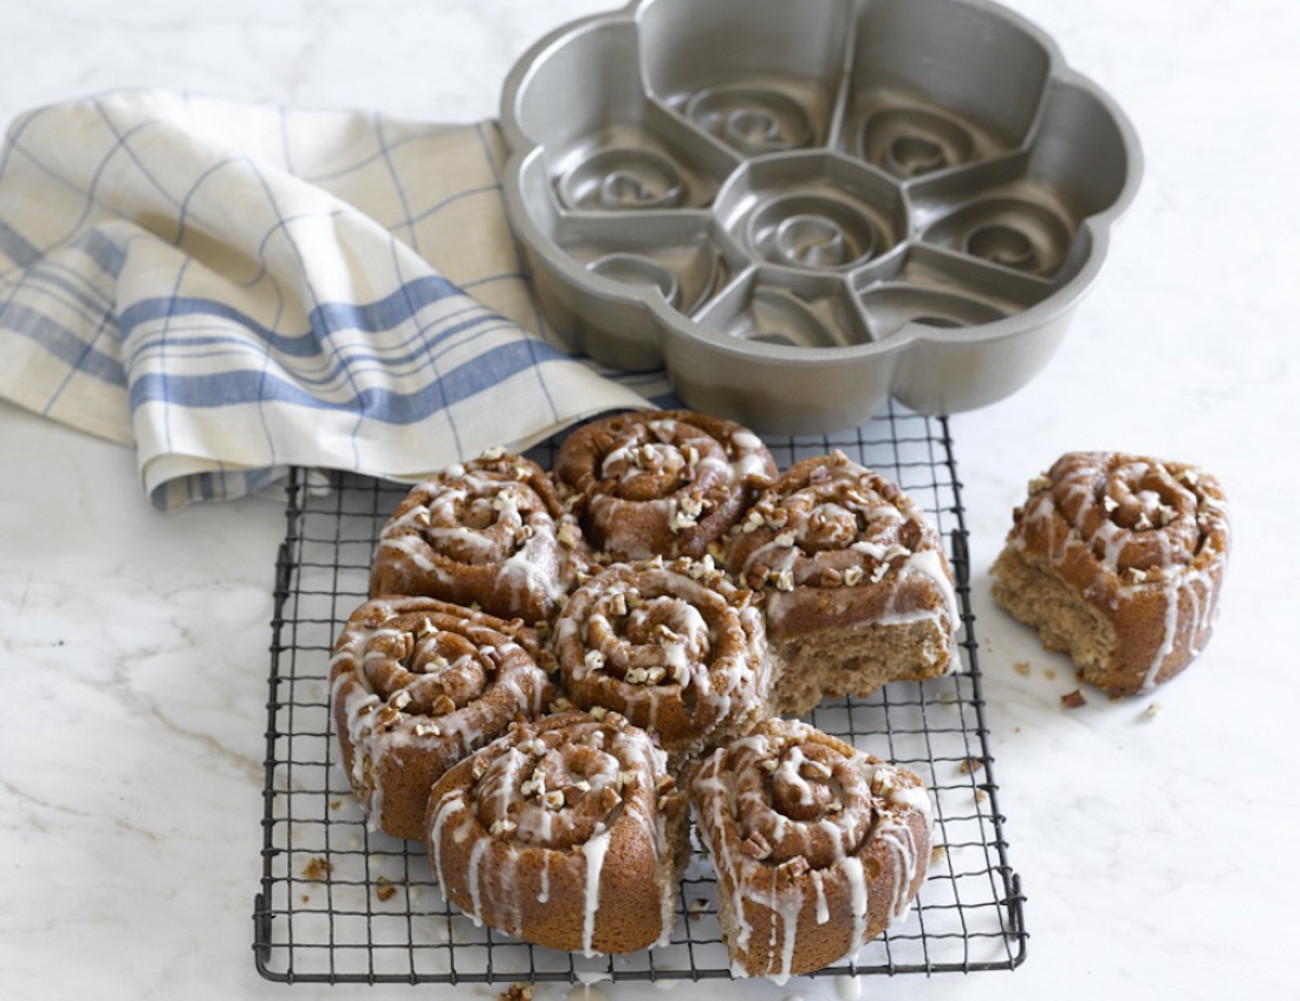 Cinnamon Bun Pan by Nordic Ware